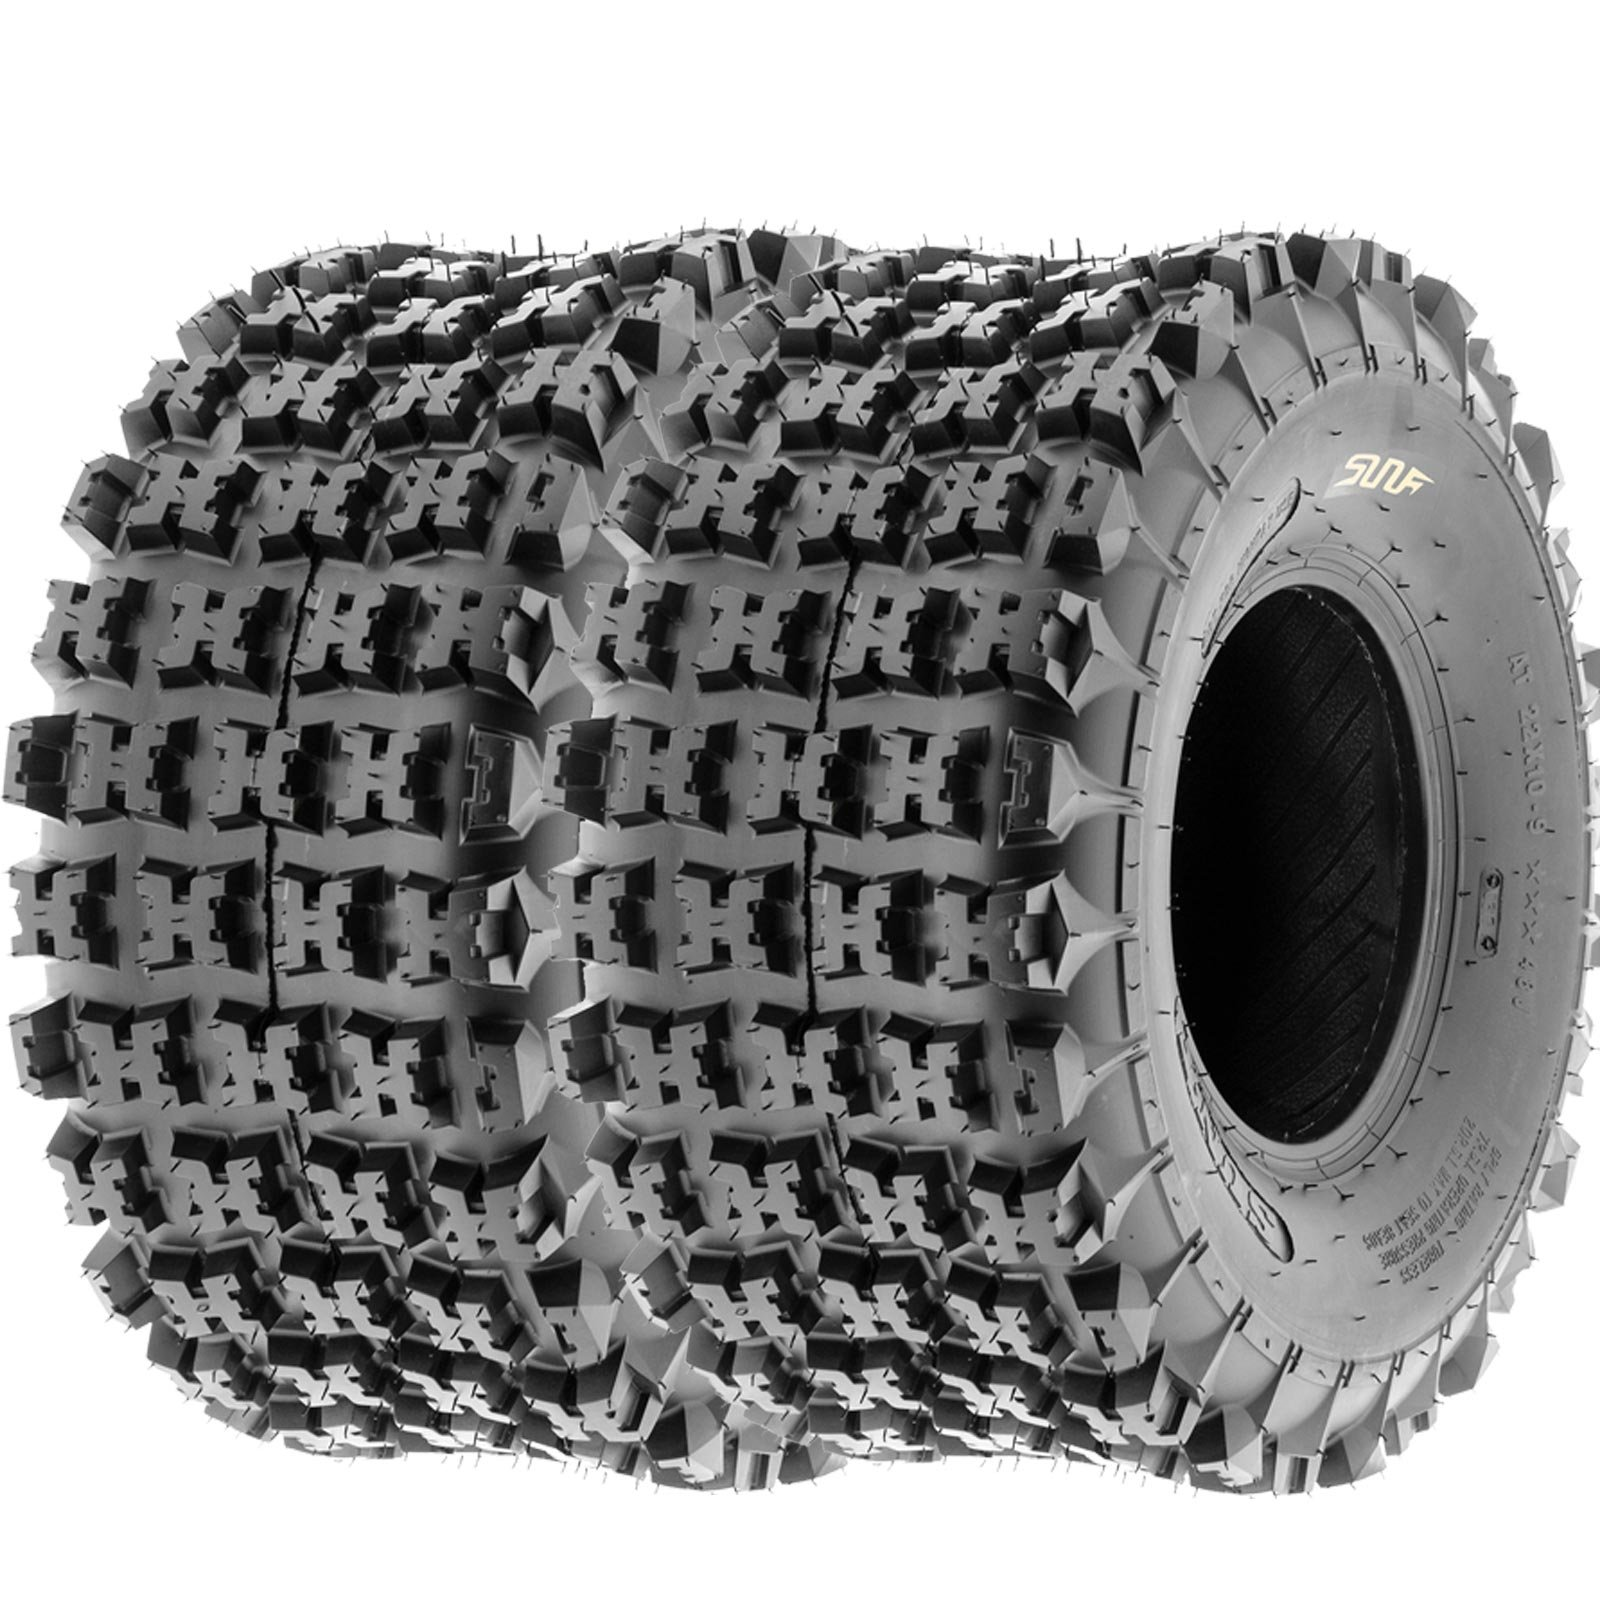 SunF 18x10.5-8 18x10.5x8 ATV UTV All Terrain Race Replacement 6 PR Tubeless Tires A027, [Set of 2] by SunF (Image #1)